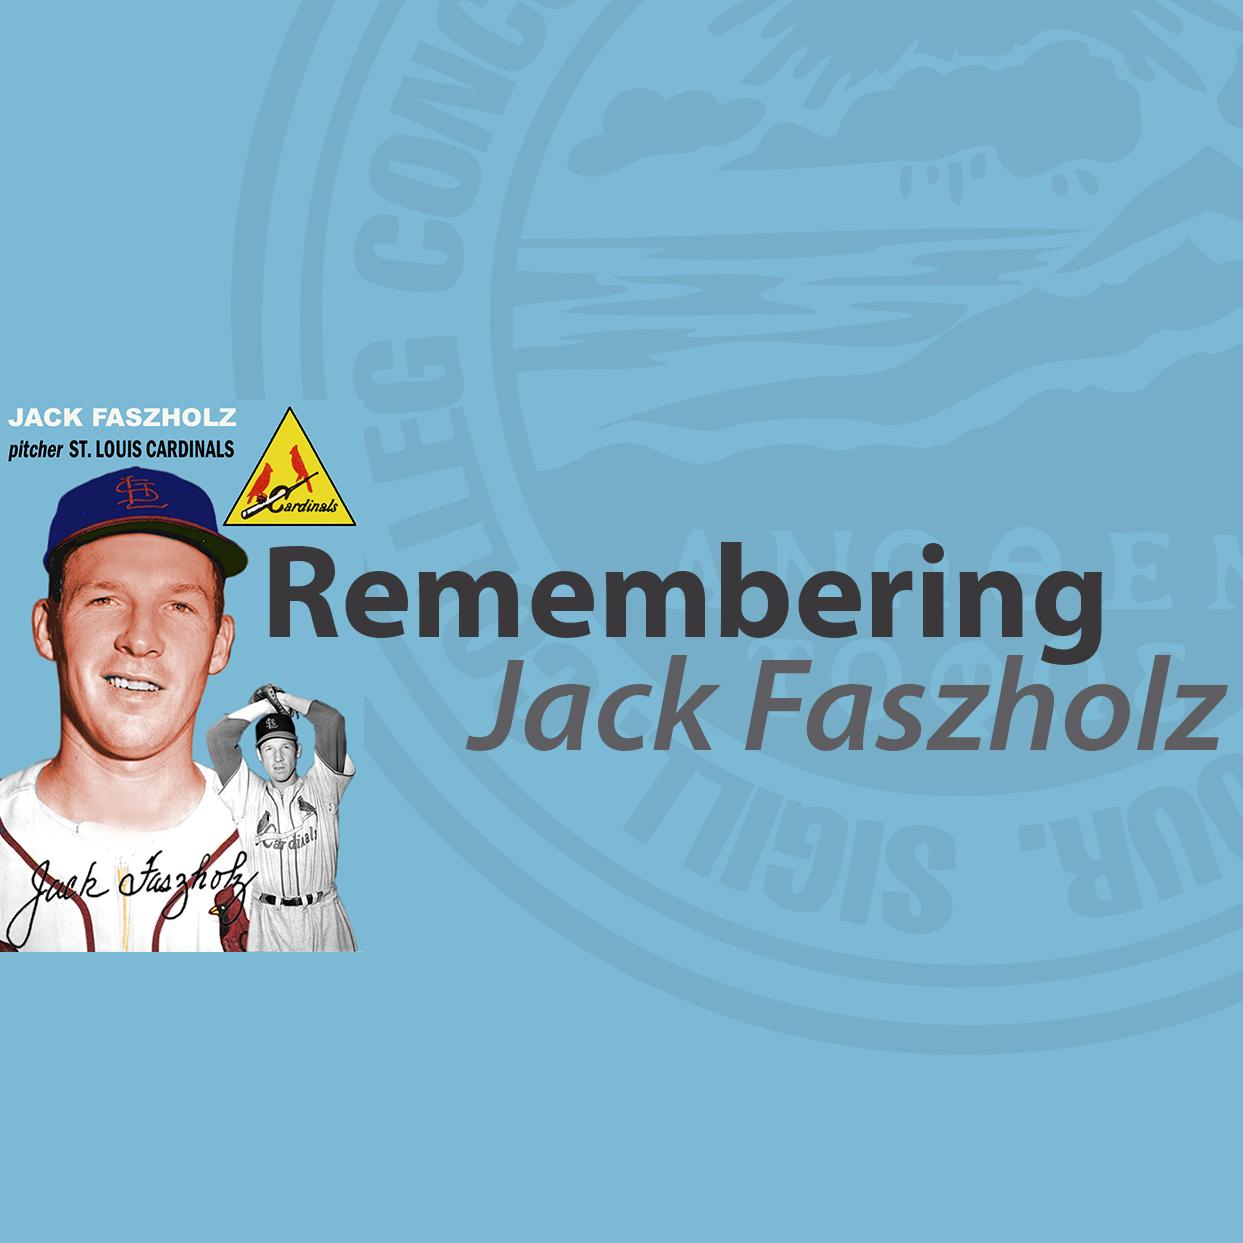 Remembering Jack Faszholz